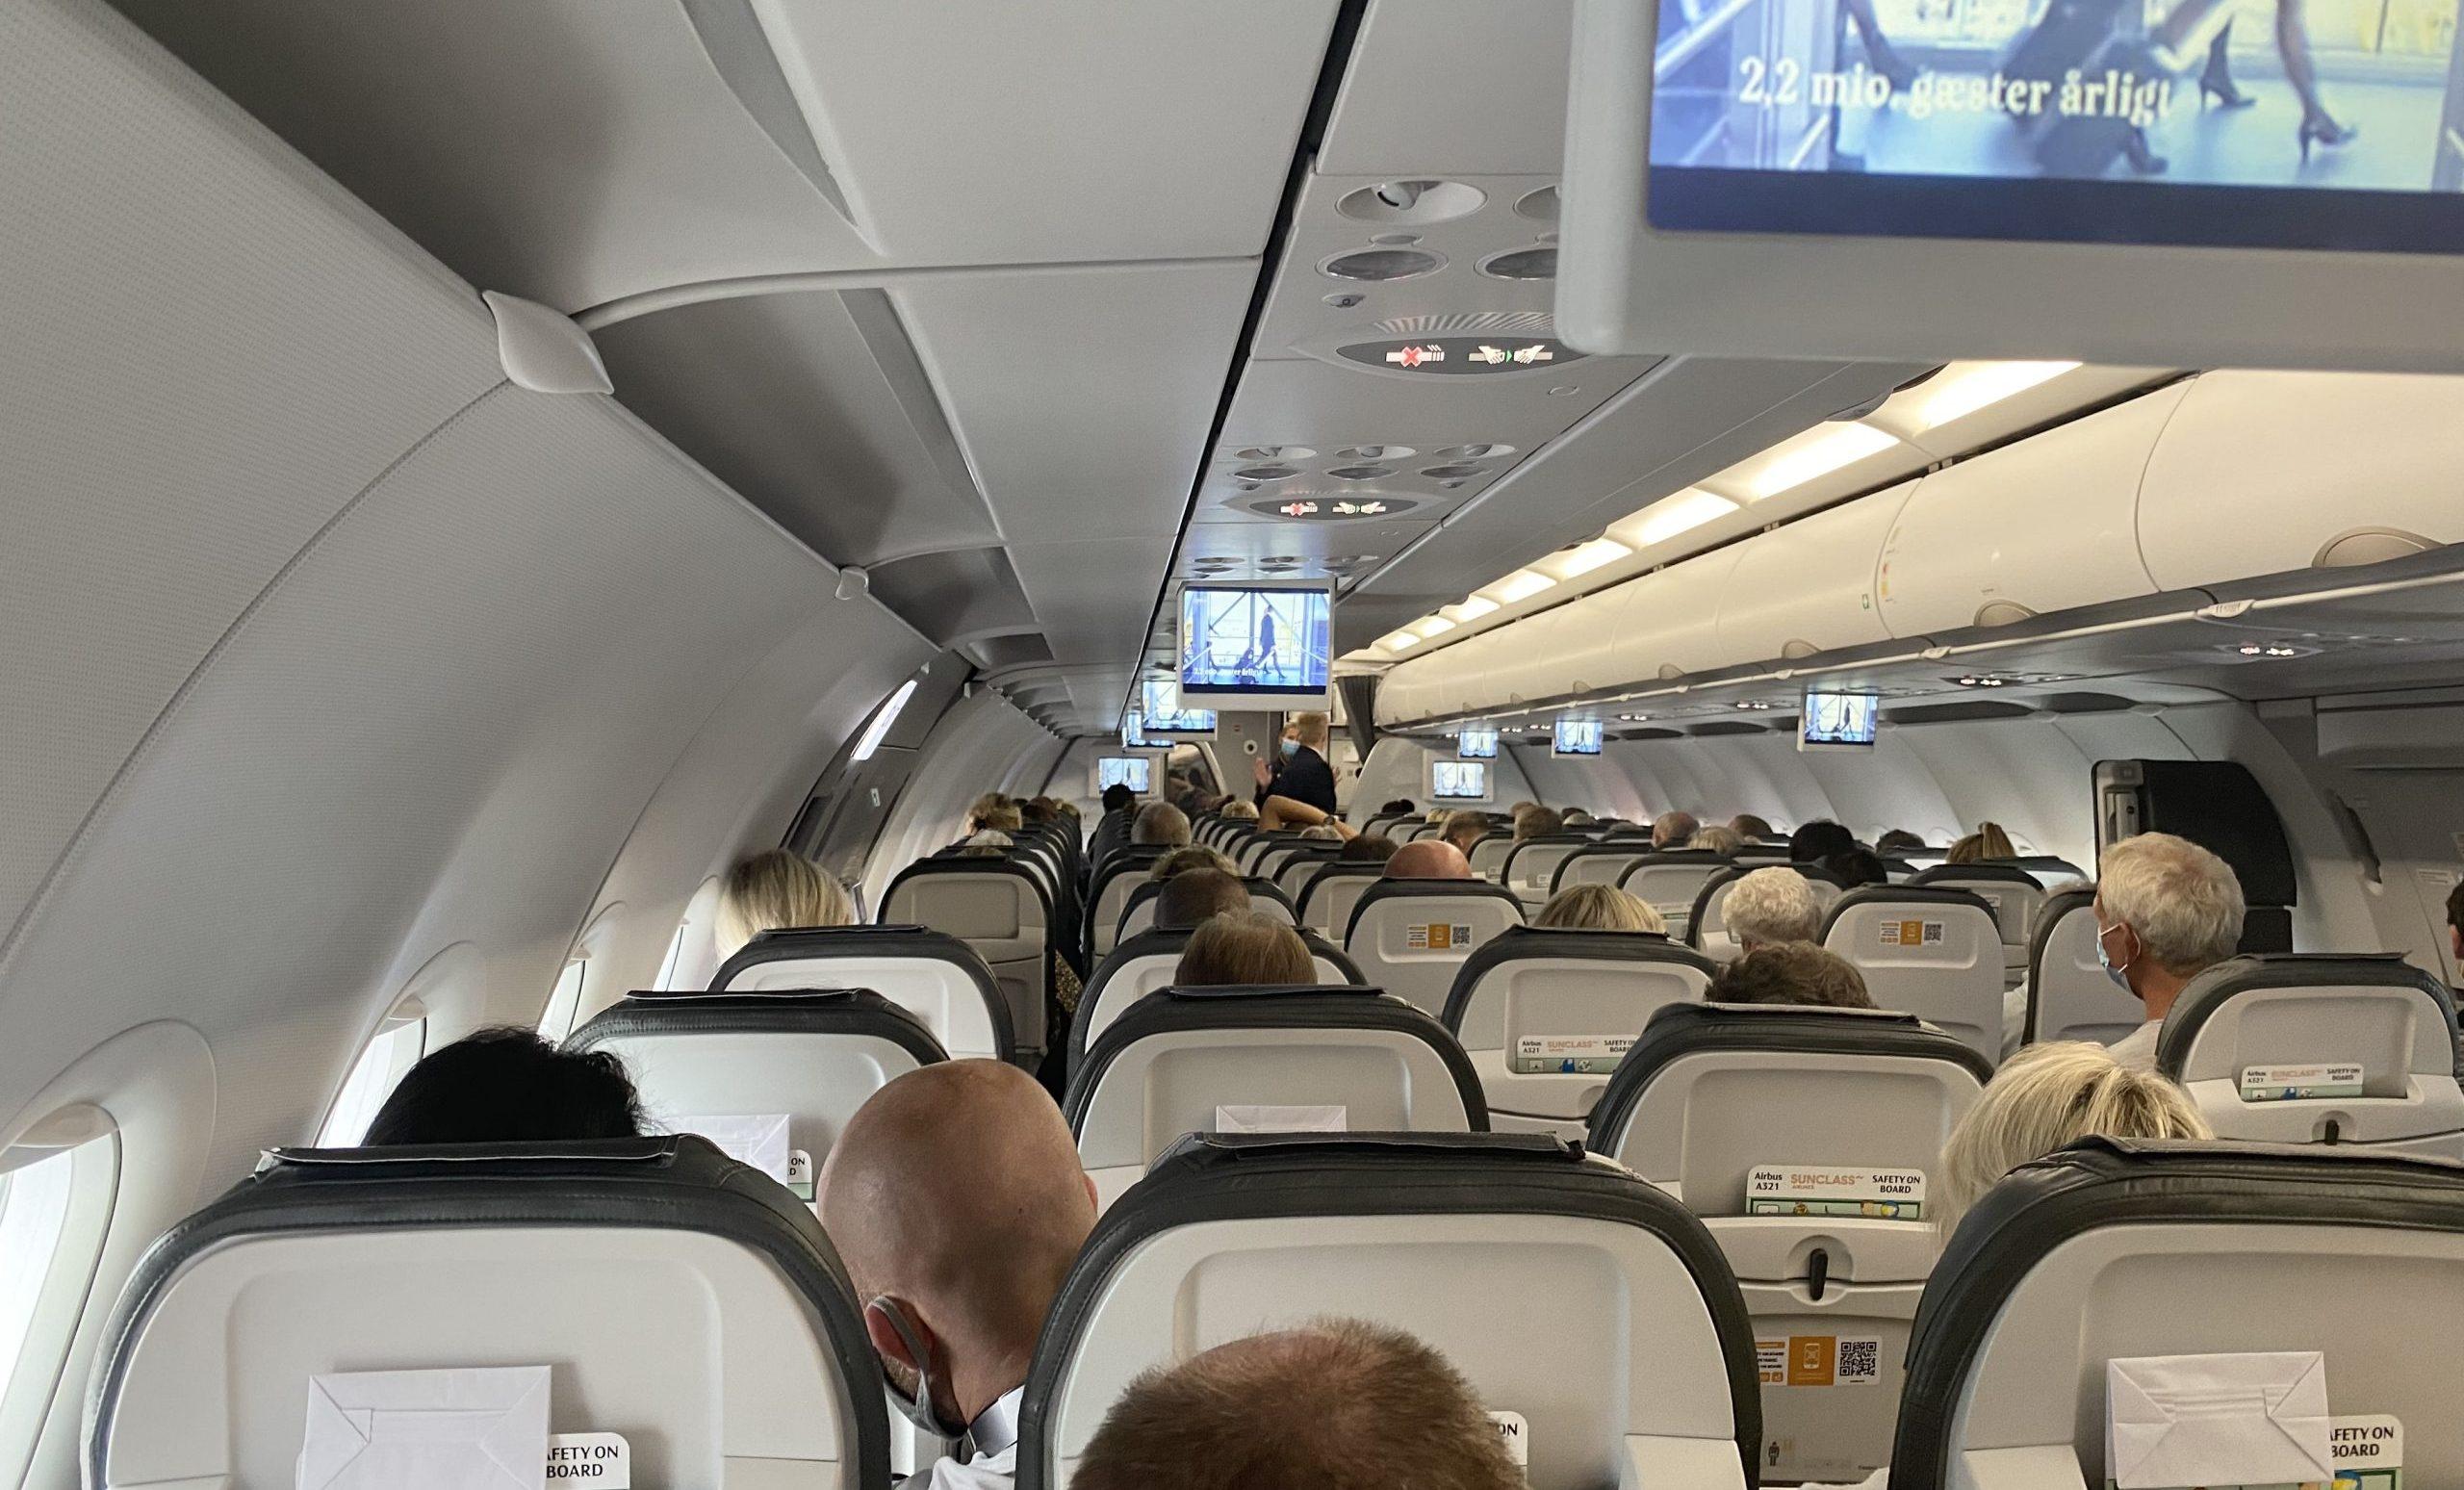 Samtlige sæder var optaget på Sunclass-flyvningen. (Foto: Danny Longhi Andreasen)